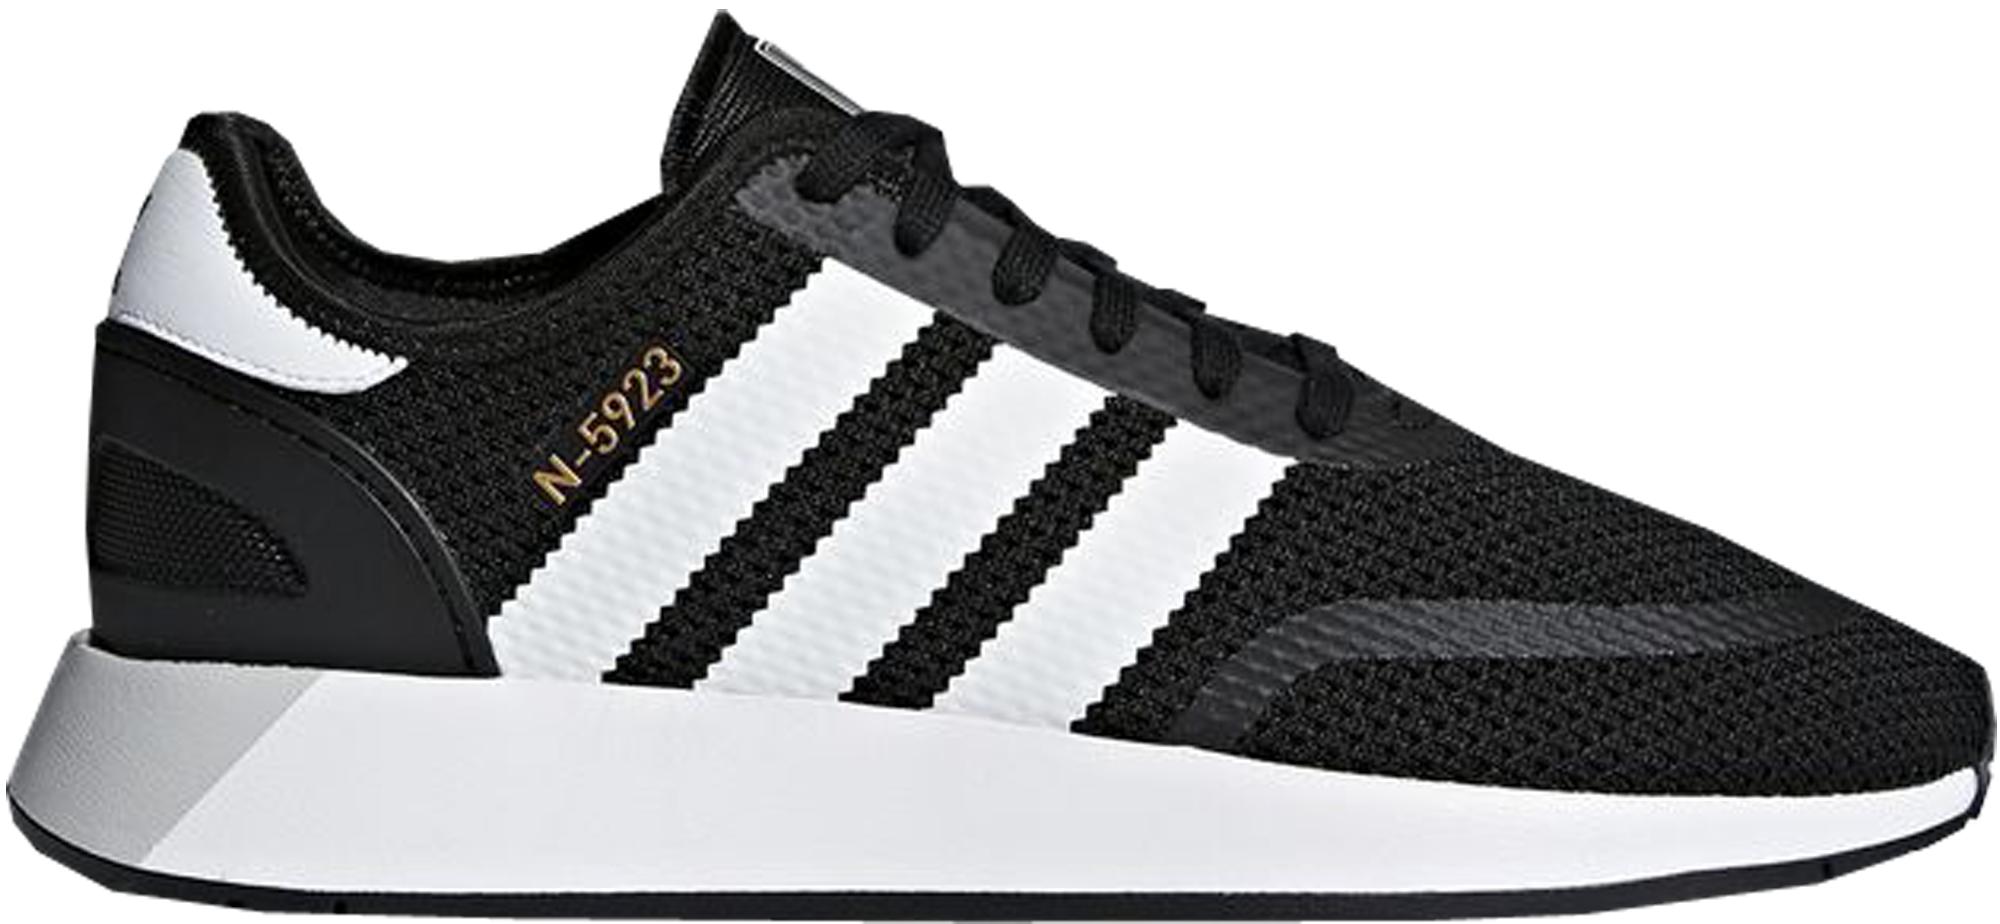 adidas N-5923 Black White